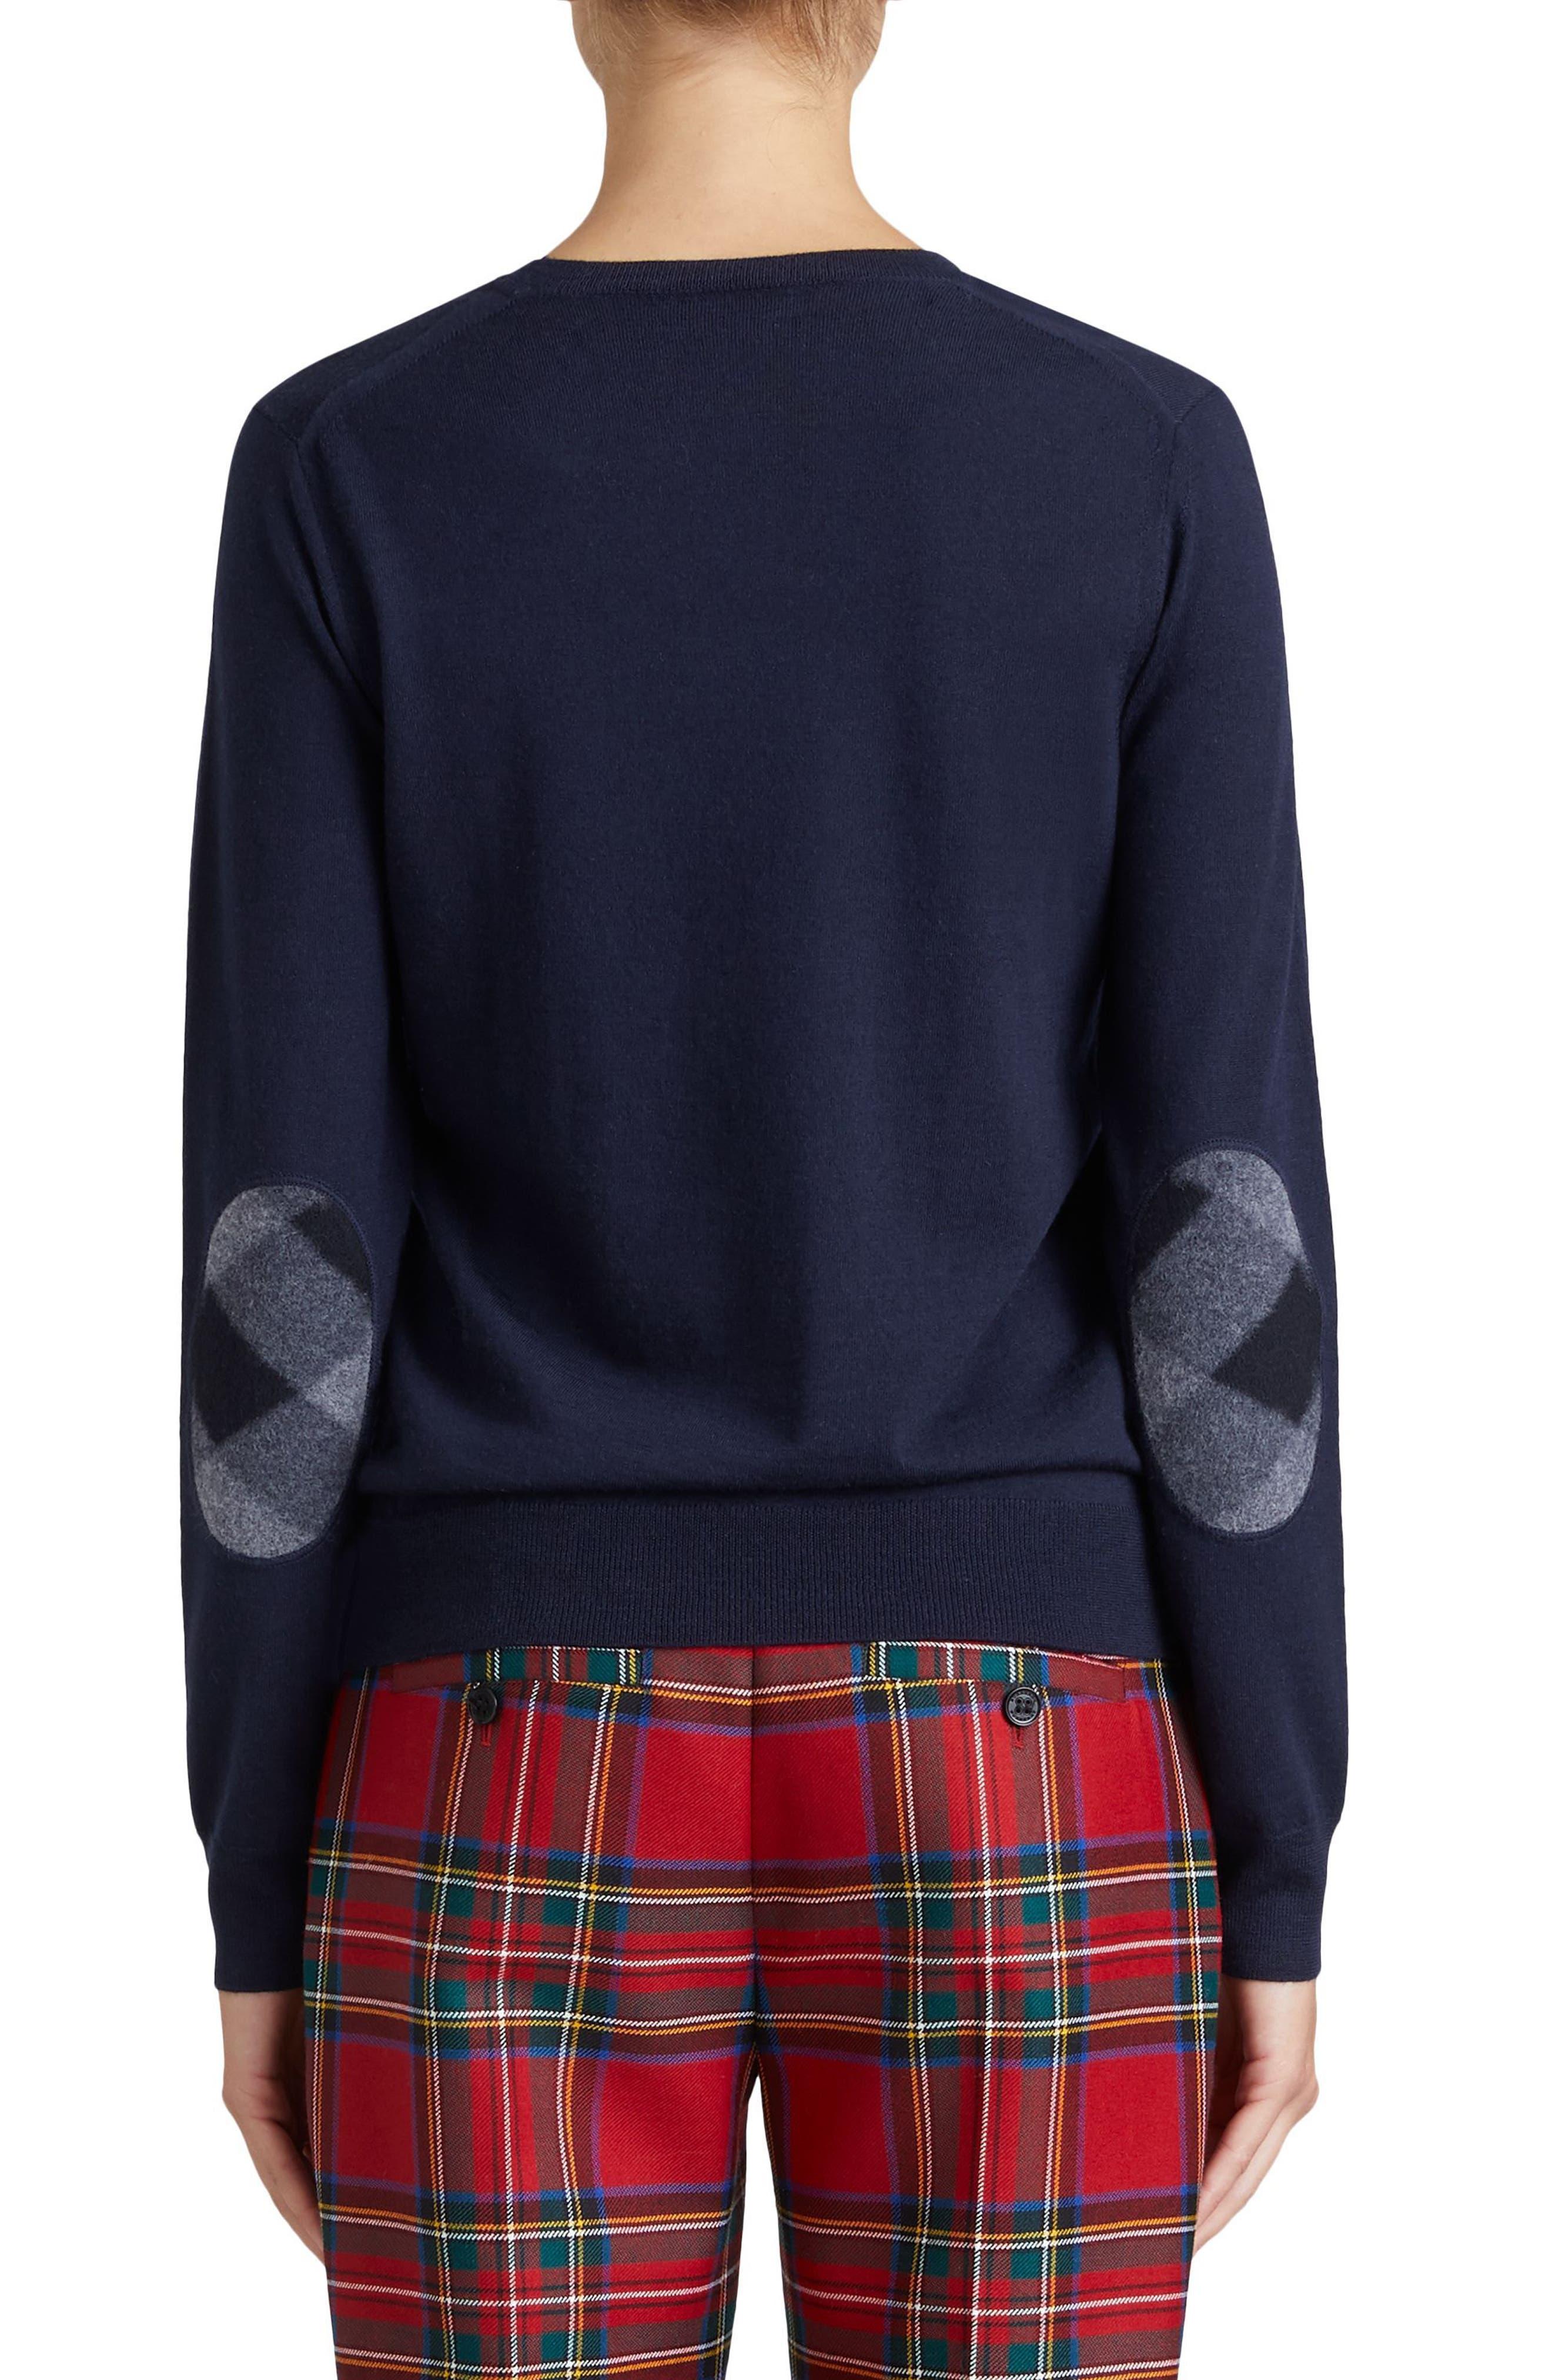 Viar Merino Wool Sweater,                             Alternate thumbnail 10, color,